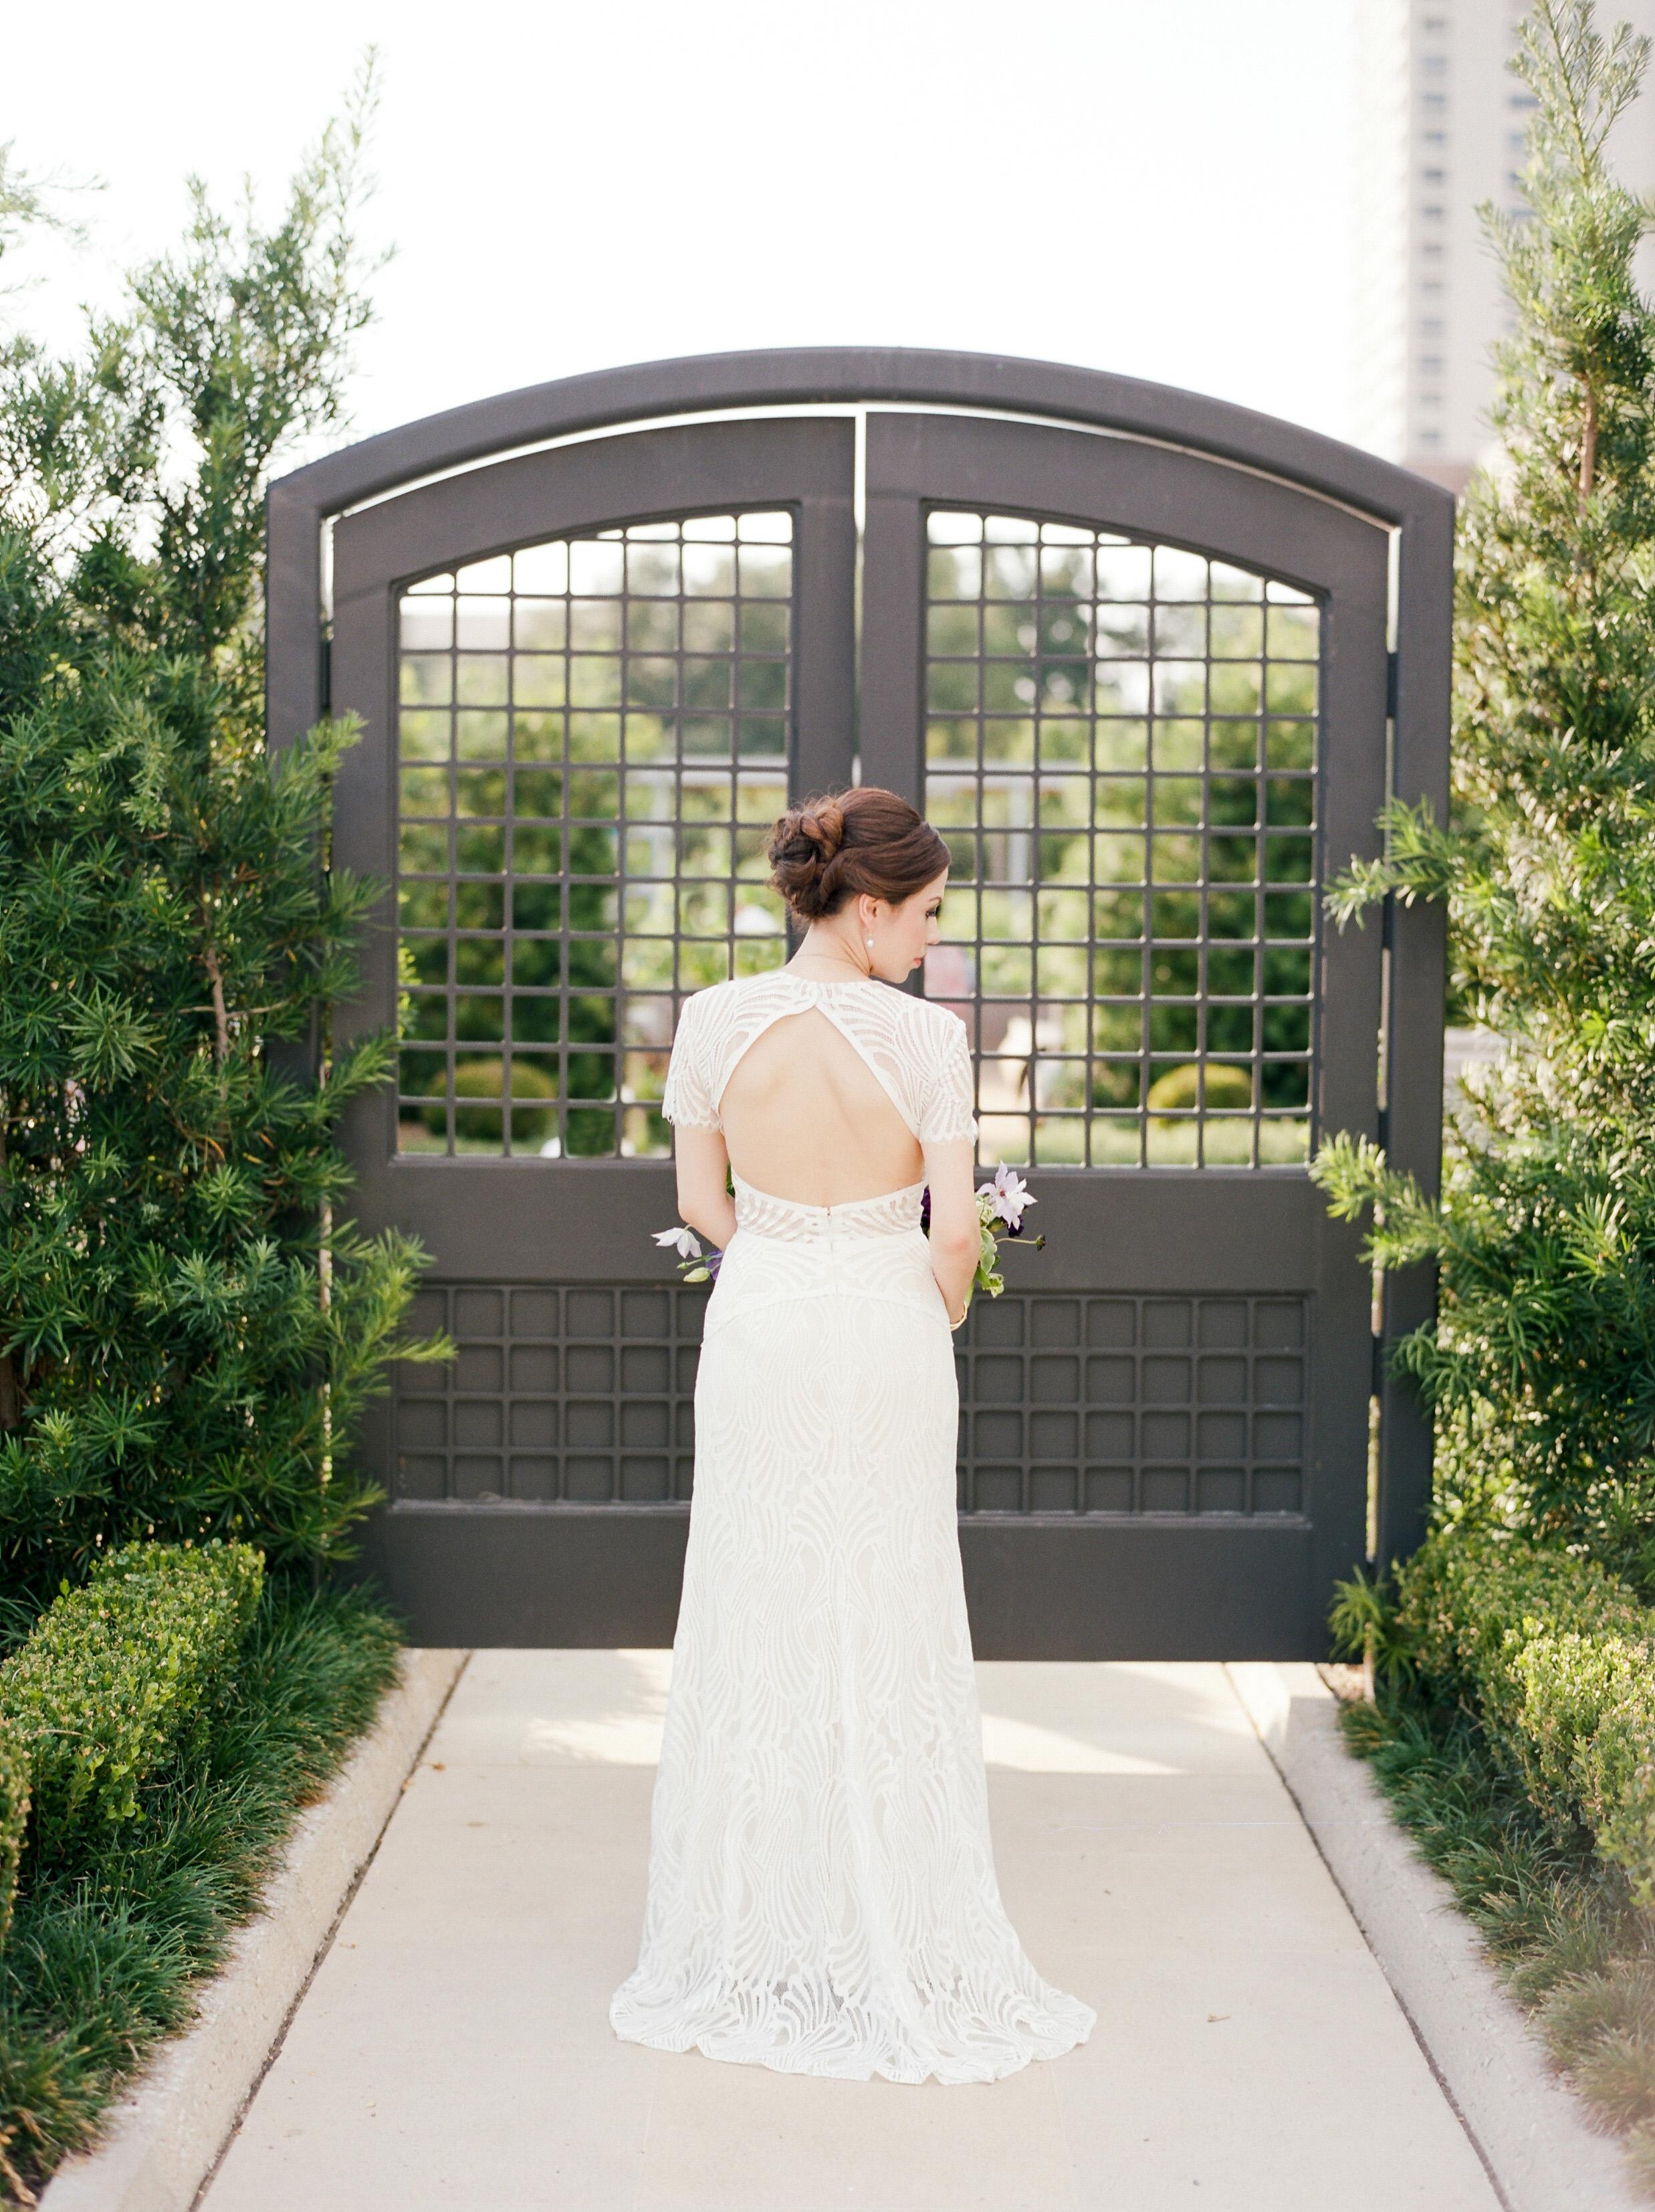 mcgovern-centennial-gardens-wedding-houston-wedding-photographer-bridals-film-austin-wedding-photographer-8.jpg